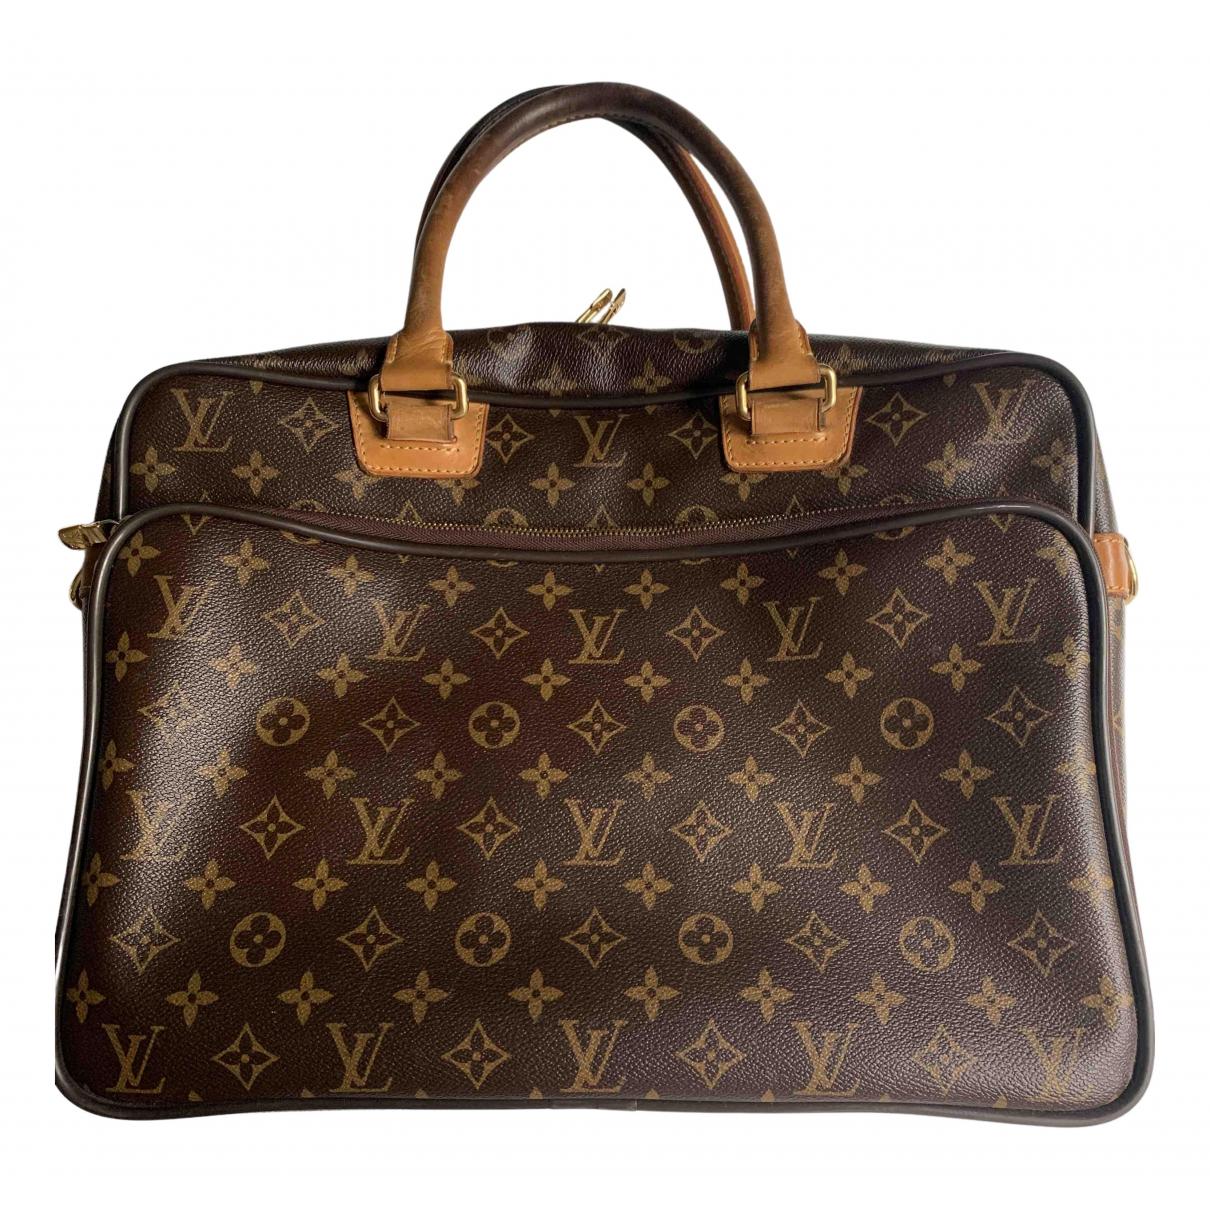 Louis Vuitton - Sac Icare pour homme en toile - marron